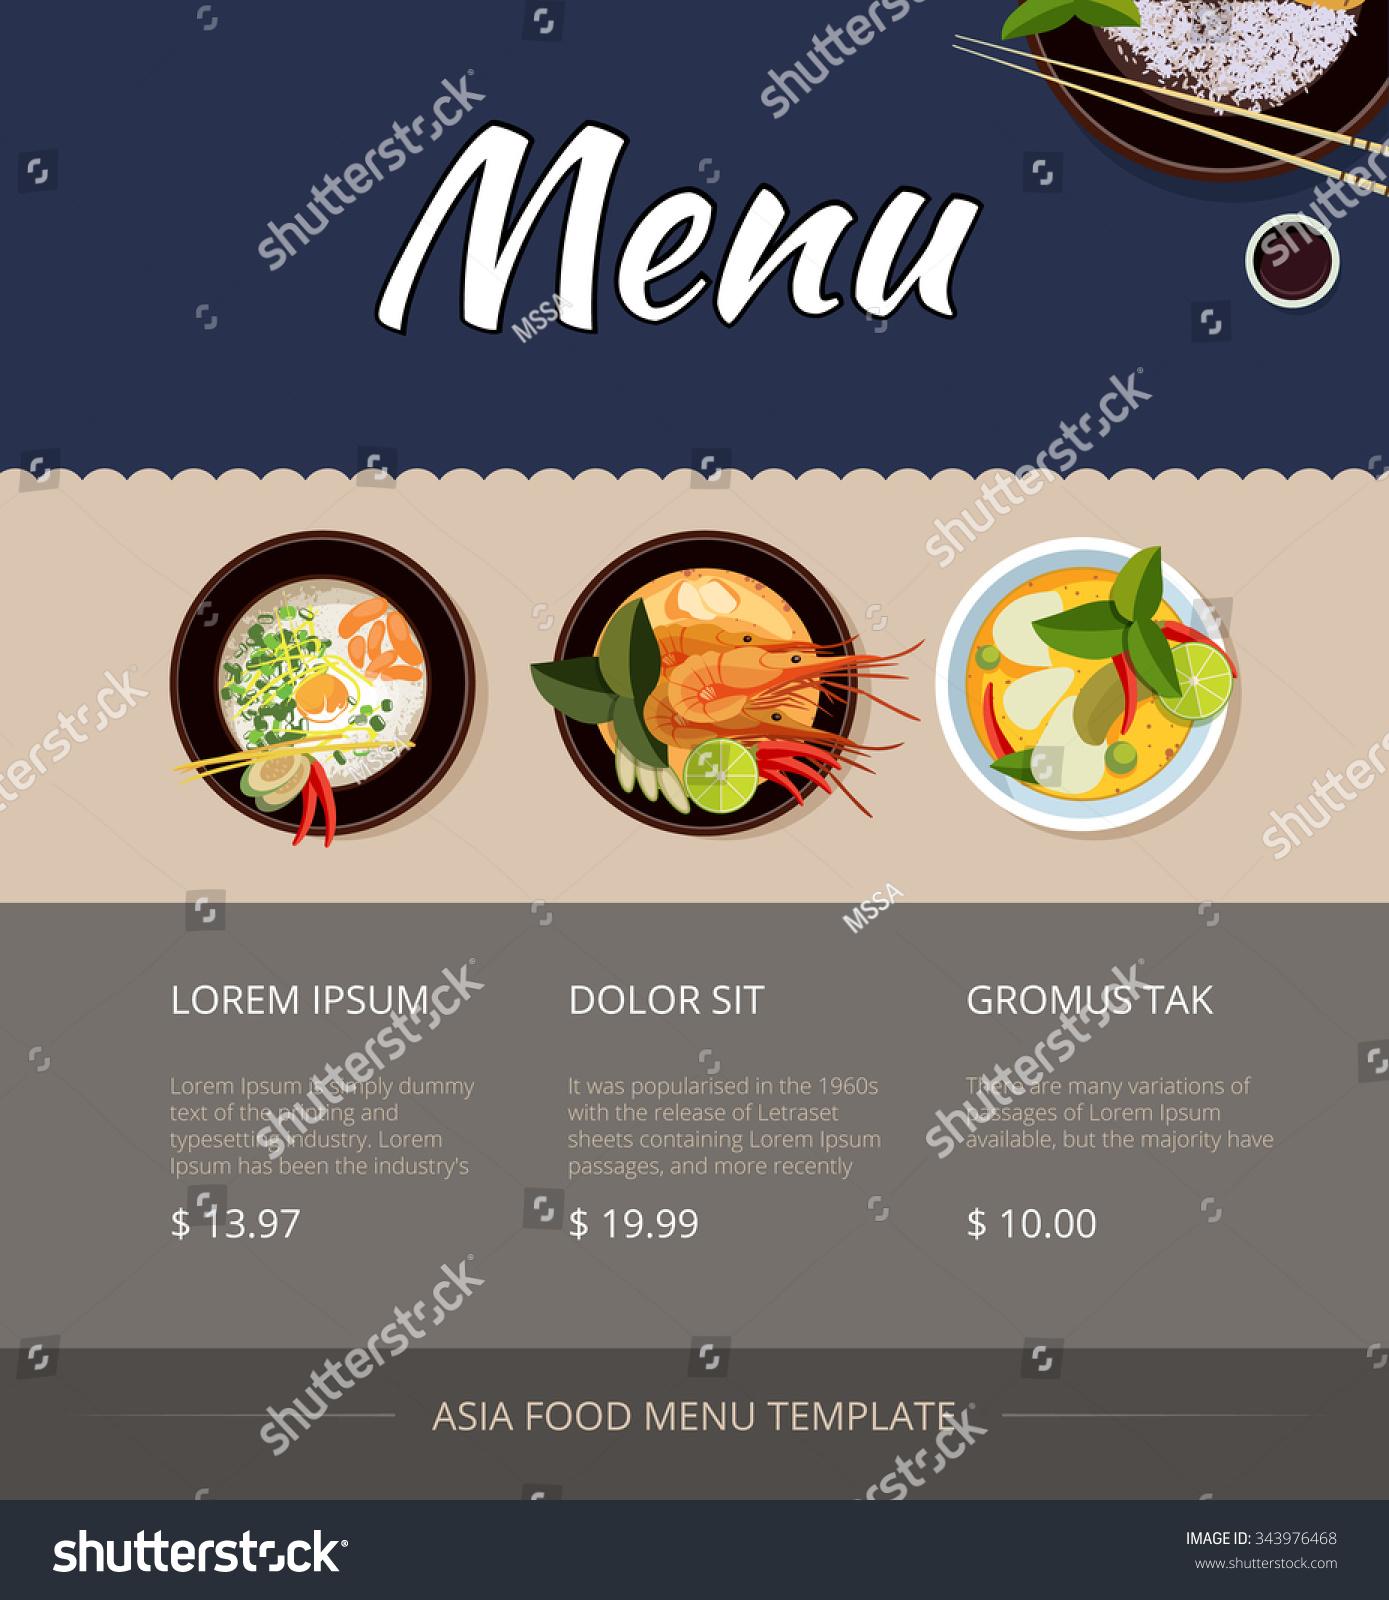 Breakfast Menu Template with blank side hotel menu template – Breakfast Menu Template